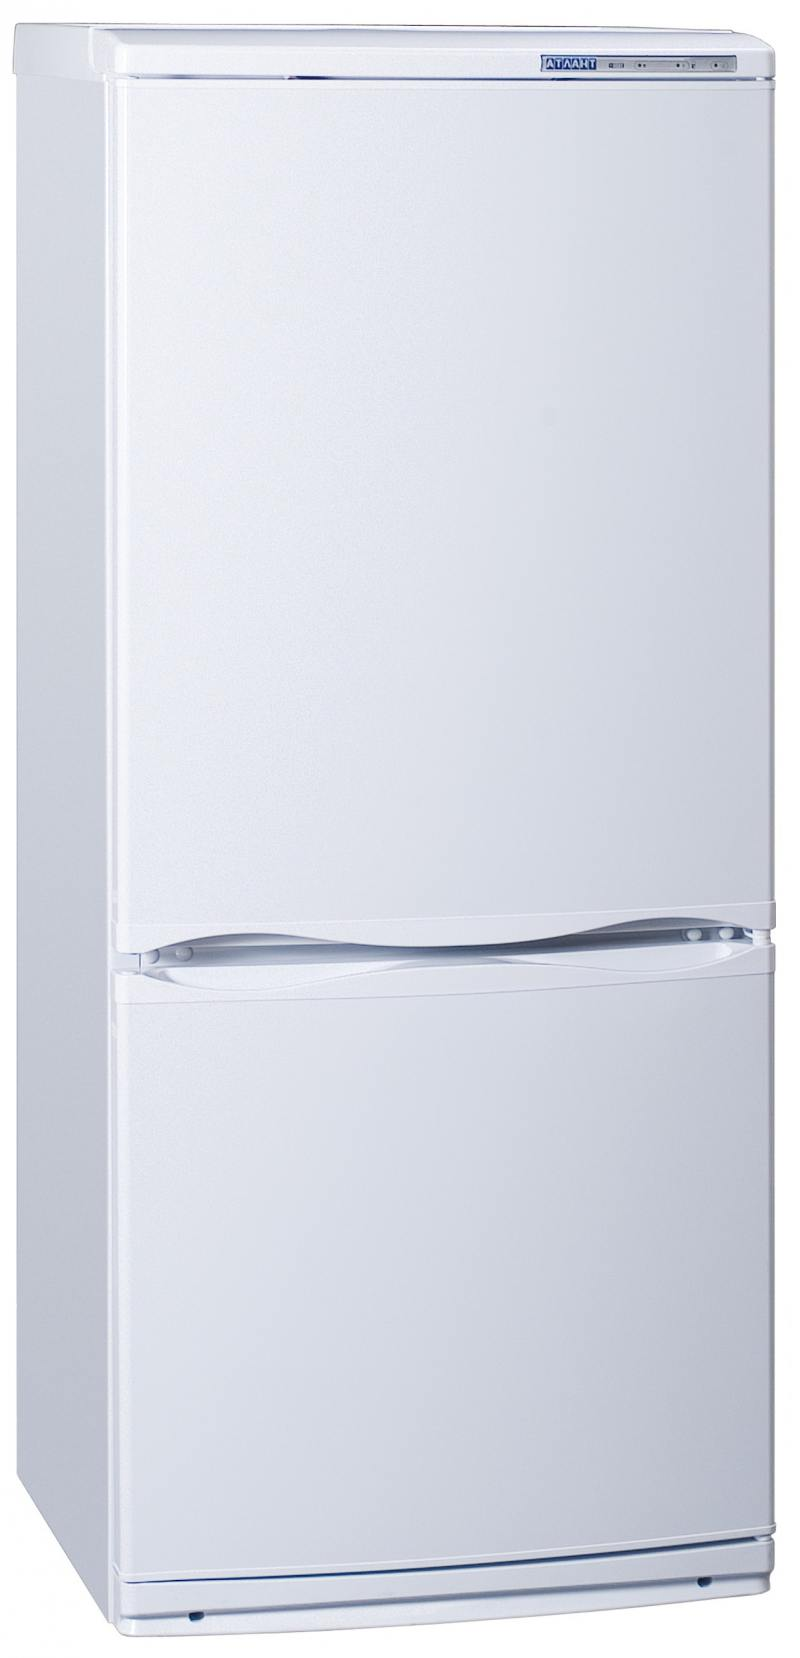 Холодильник ATLANT 4008-022 холодильник атлант 4008 022